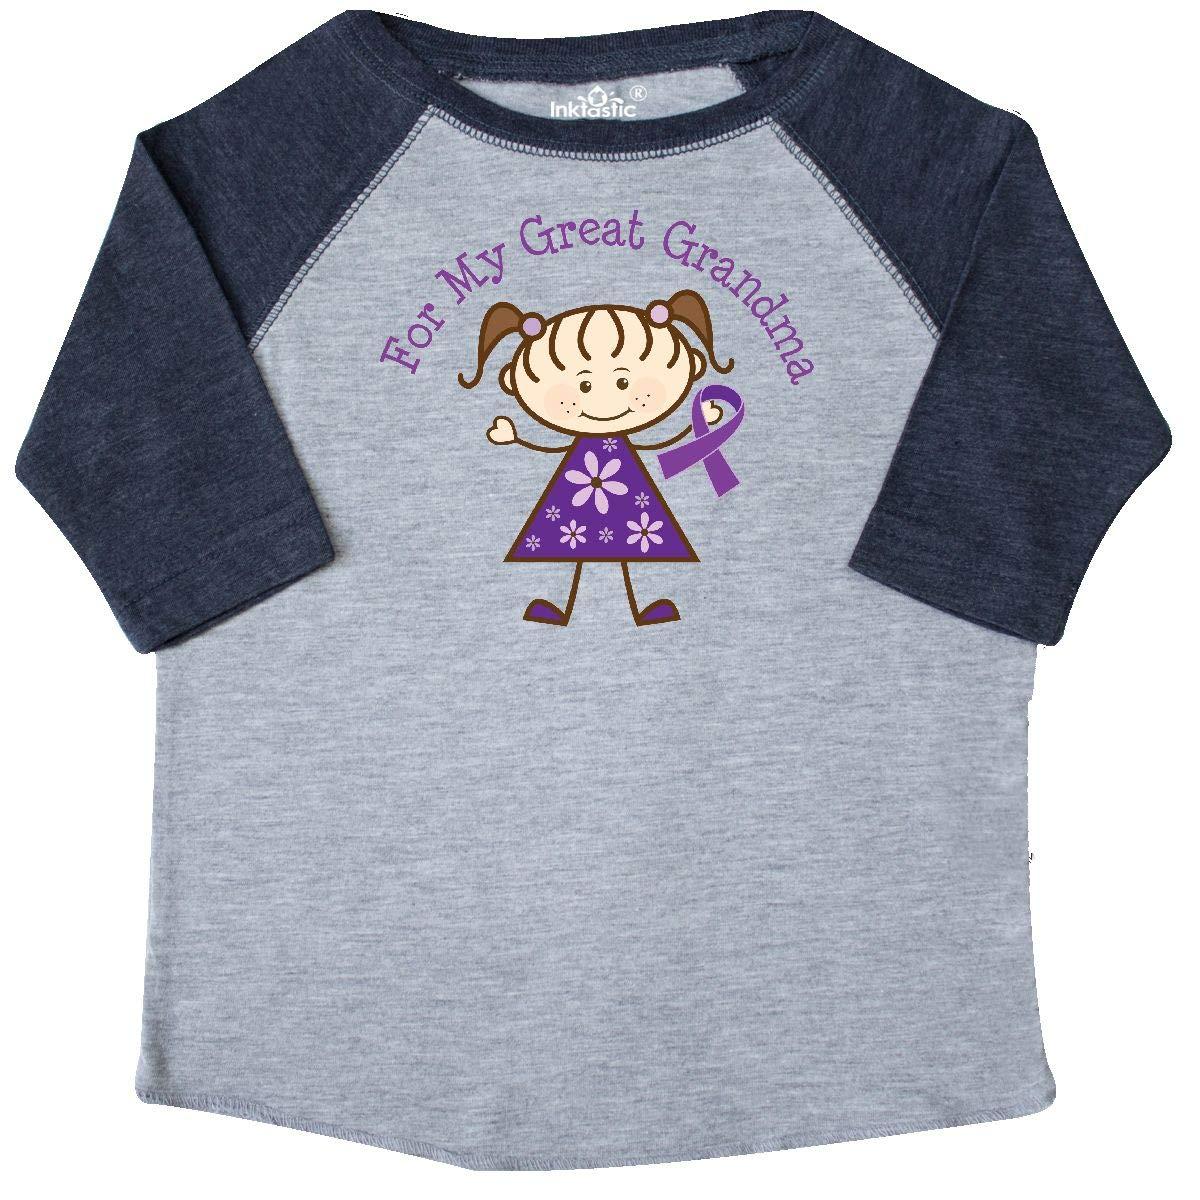 inktastic Alzheimers Awareness Great Grandma Ribbon Toddler T-Shirt